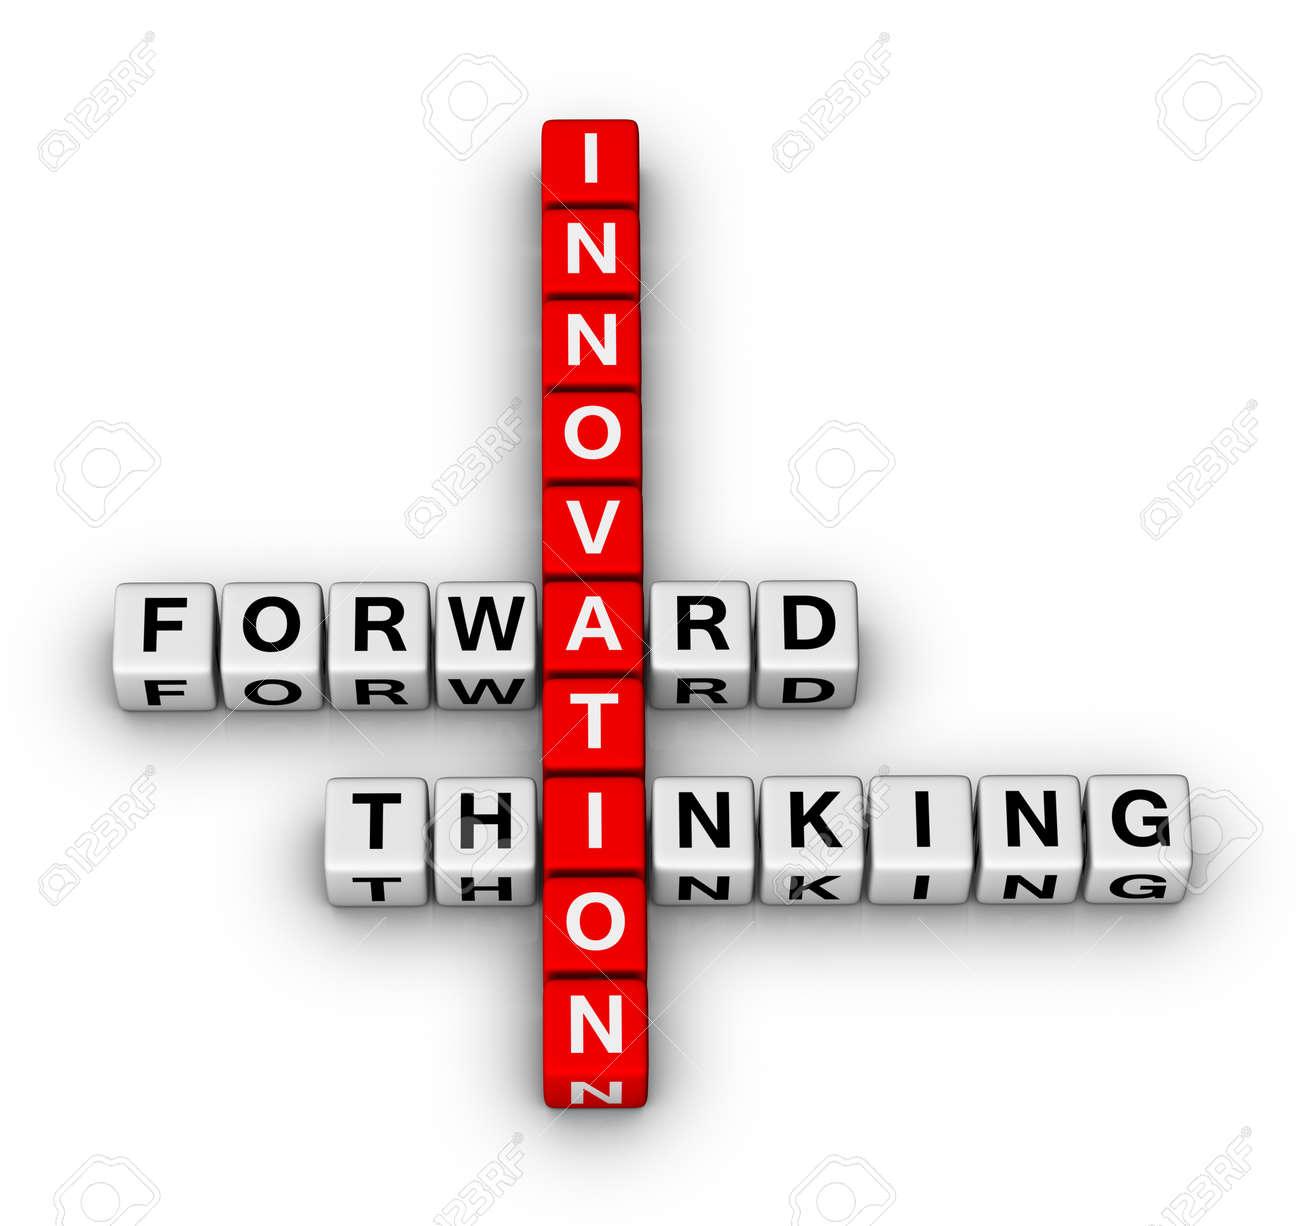 forward thinking innovation crossword puzzle Stock Photo - 9673138